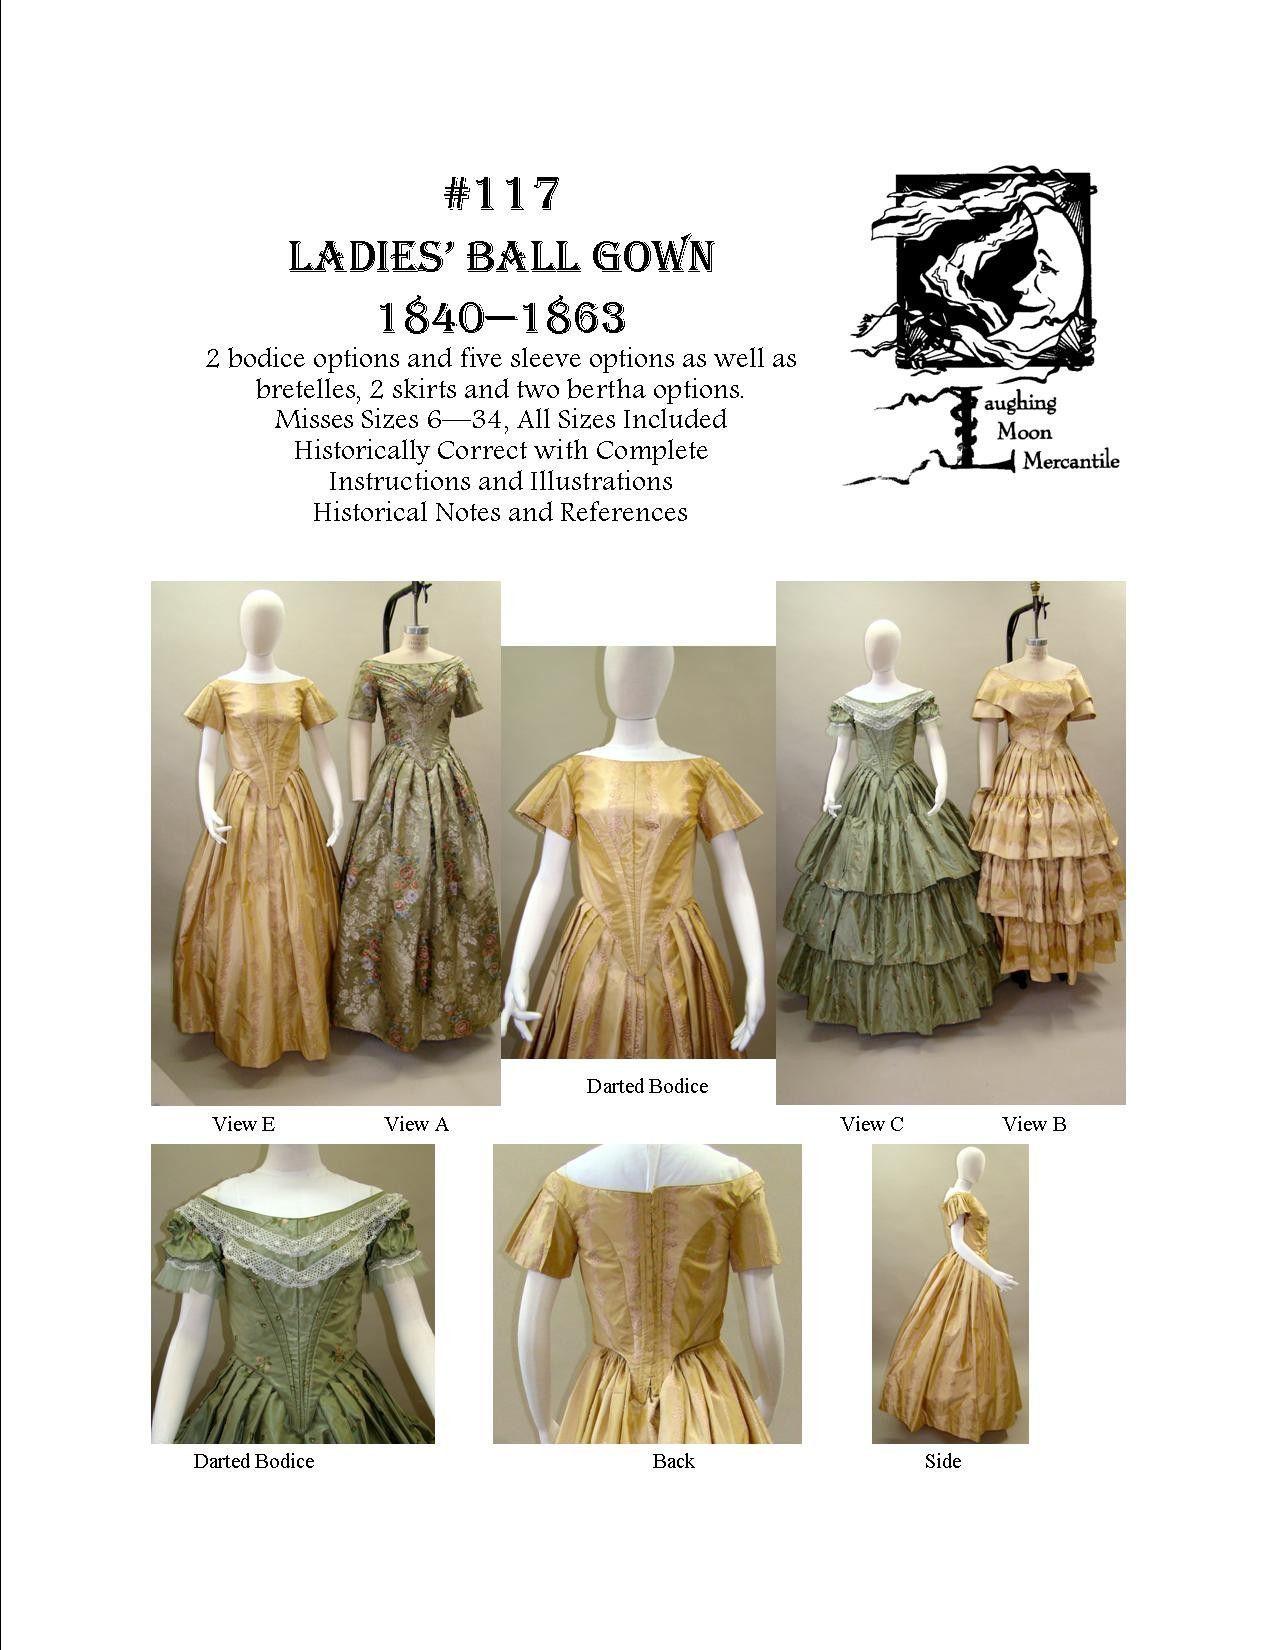 Ladiesu ball gown historical fashion us to